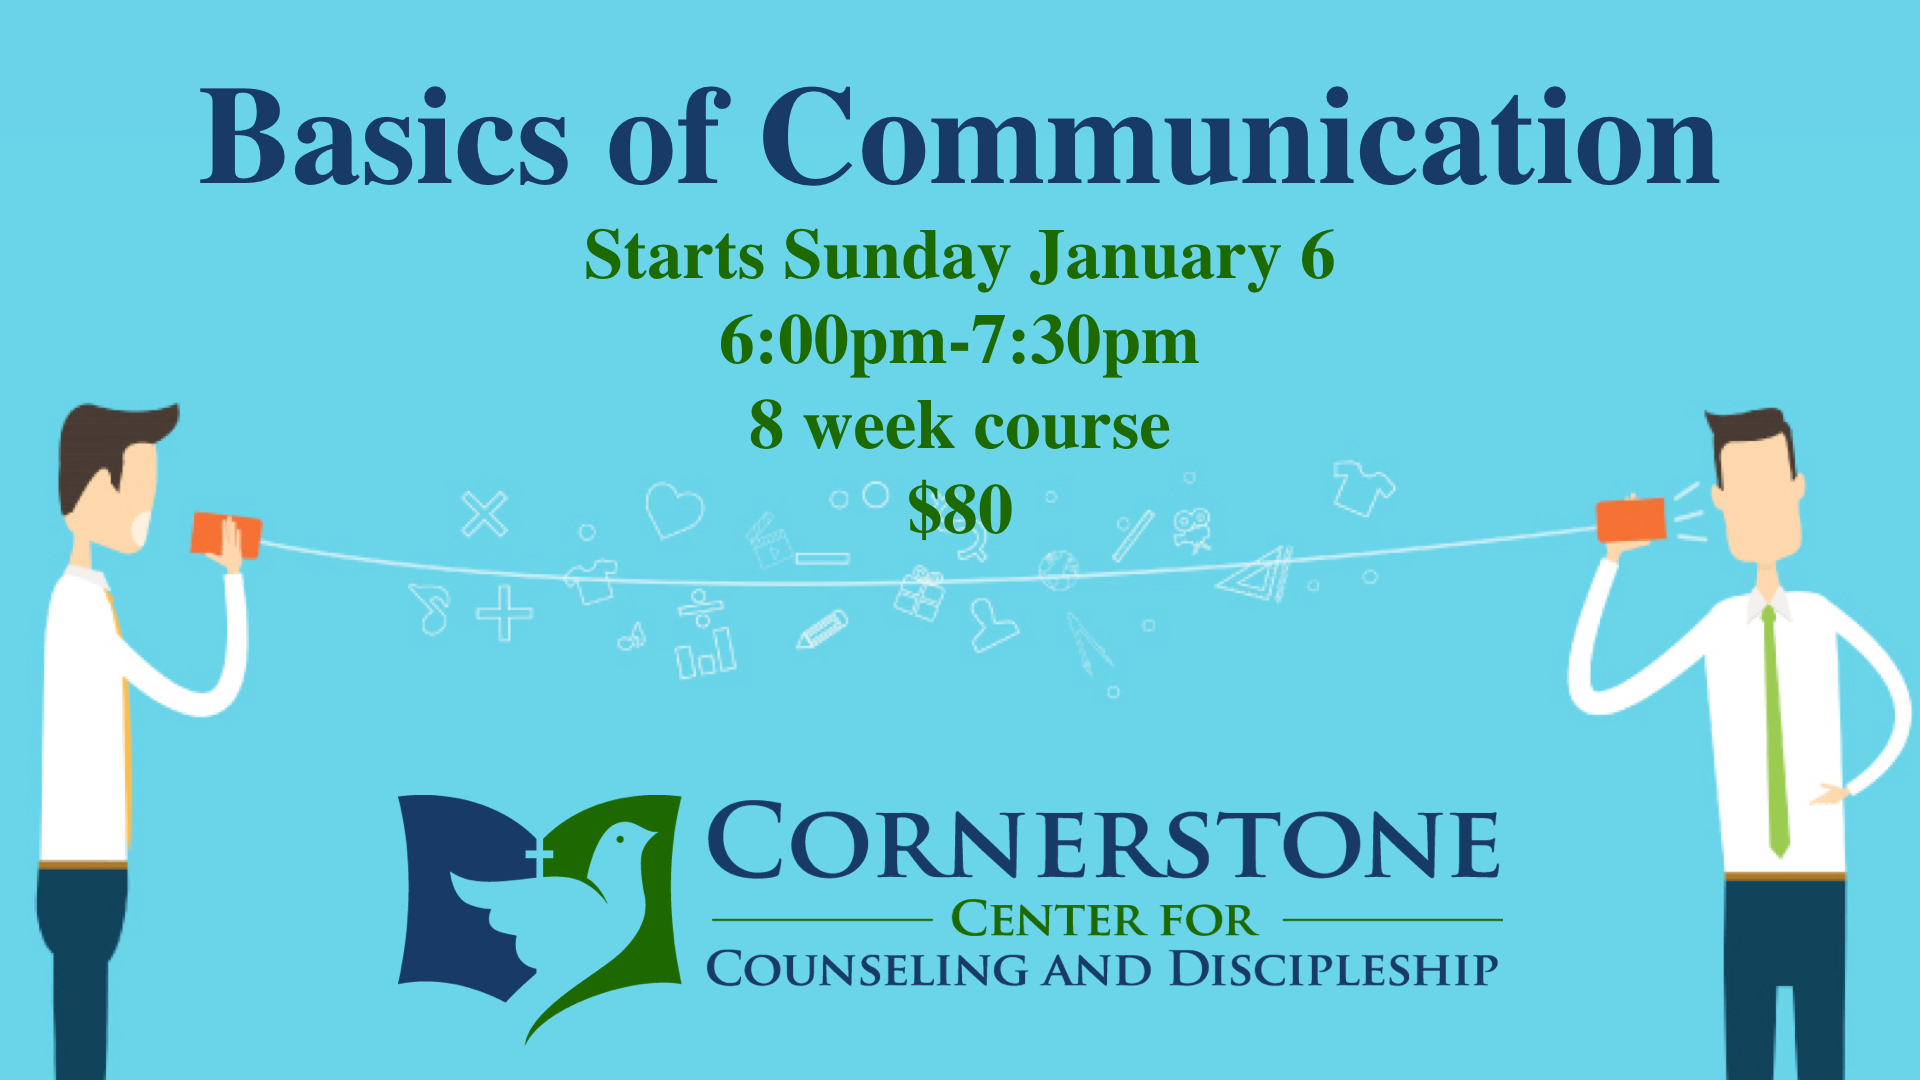 Basics of Communication ad.001.jpeg